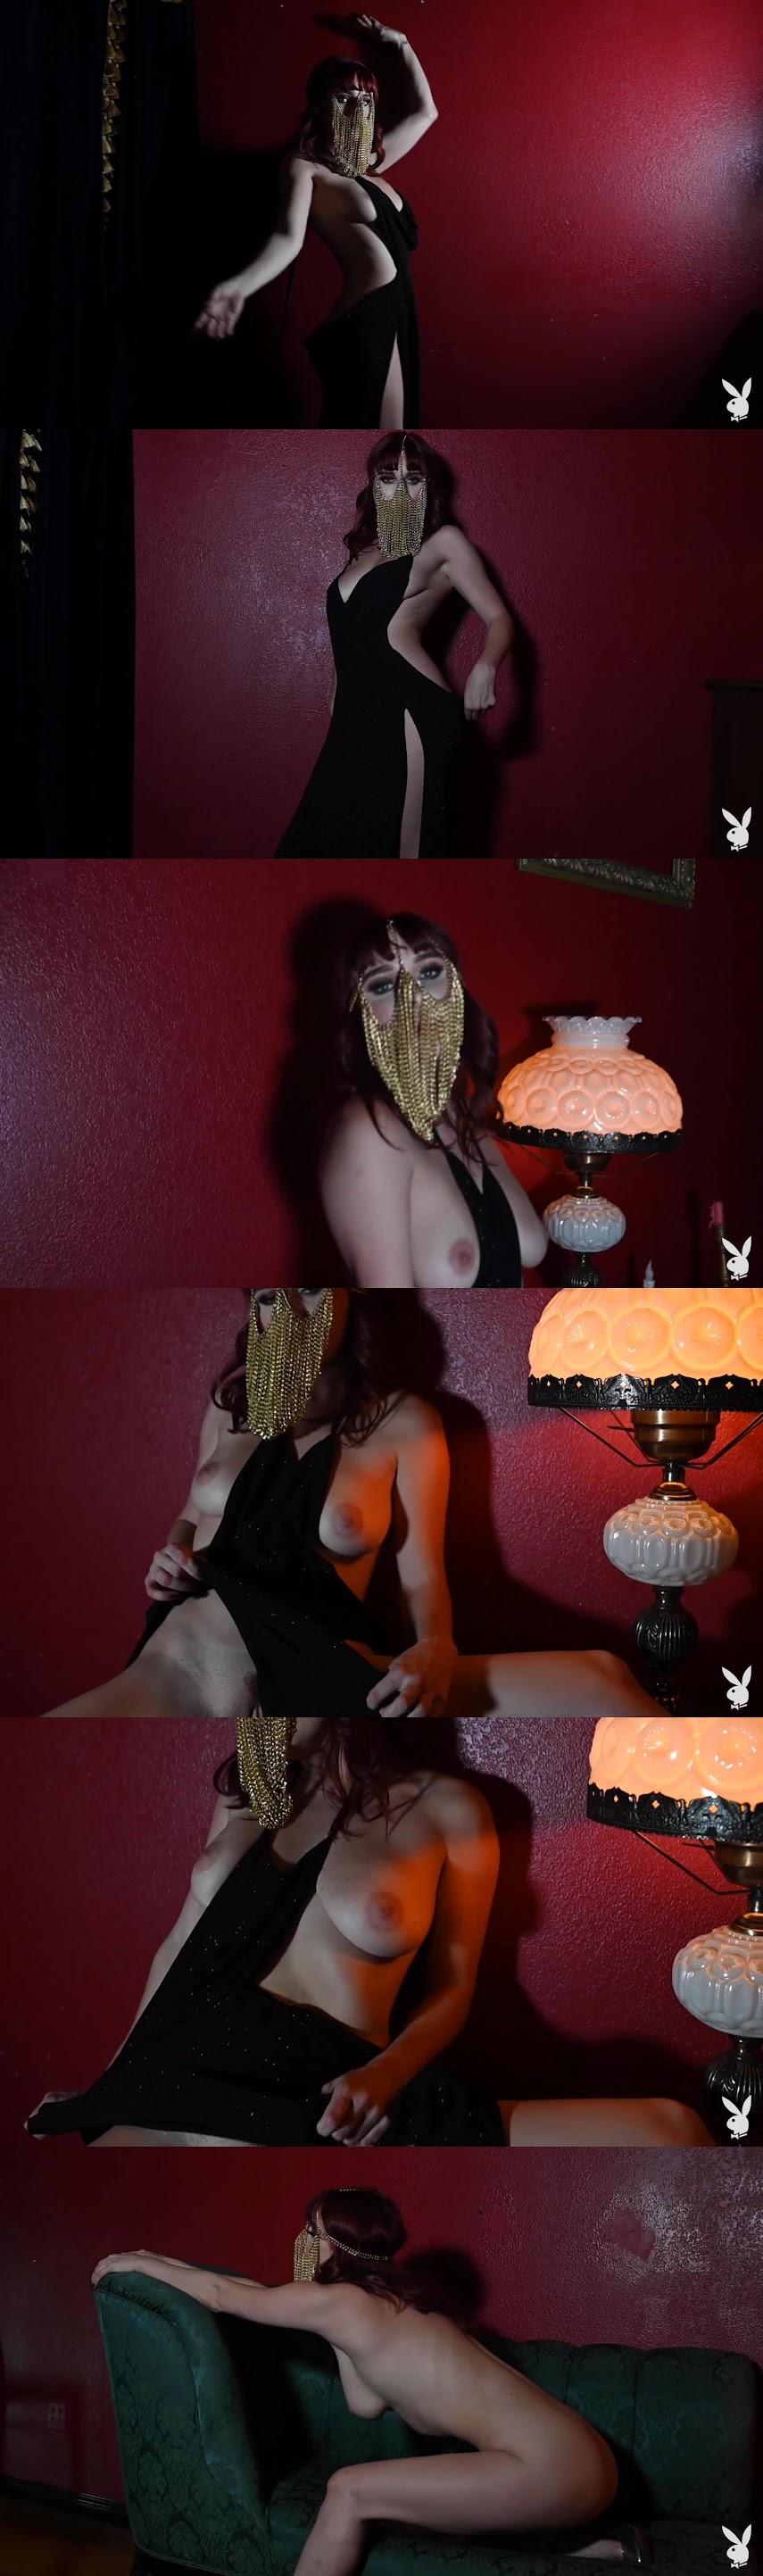 [Playboy Plus] Odette in Slow RevealReal Street Angels